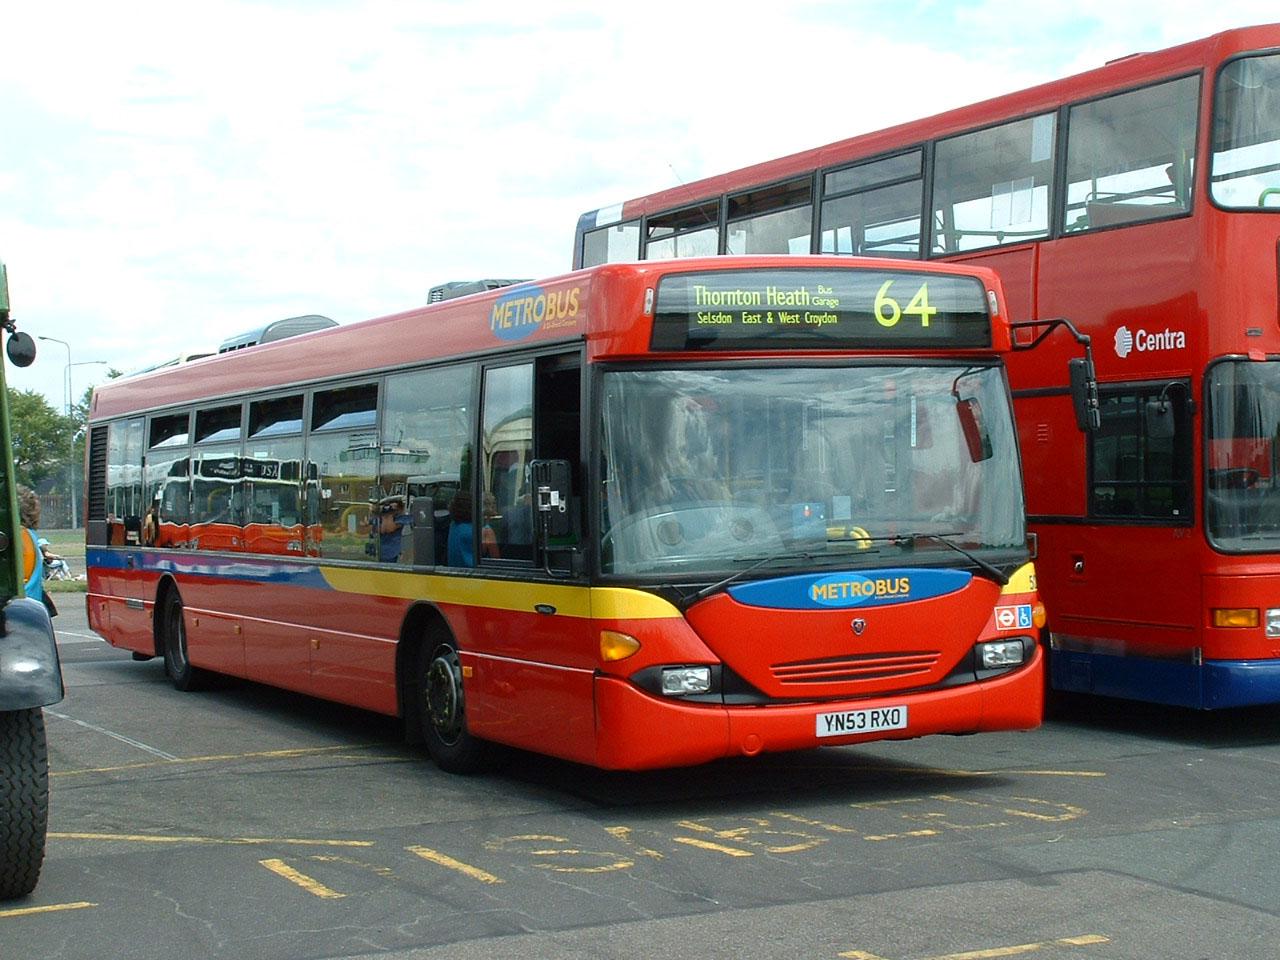 Metrobus - SHOWBUS LONDON PHOTO GALLERY